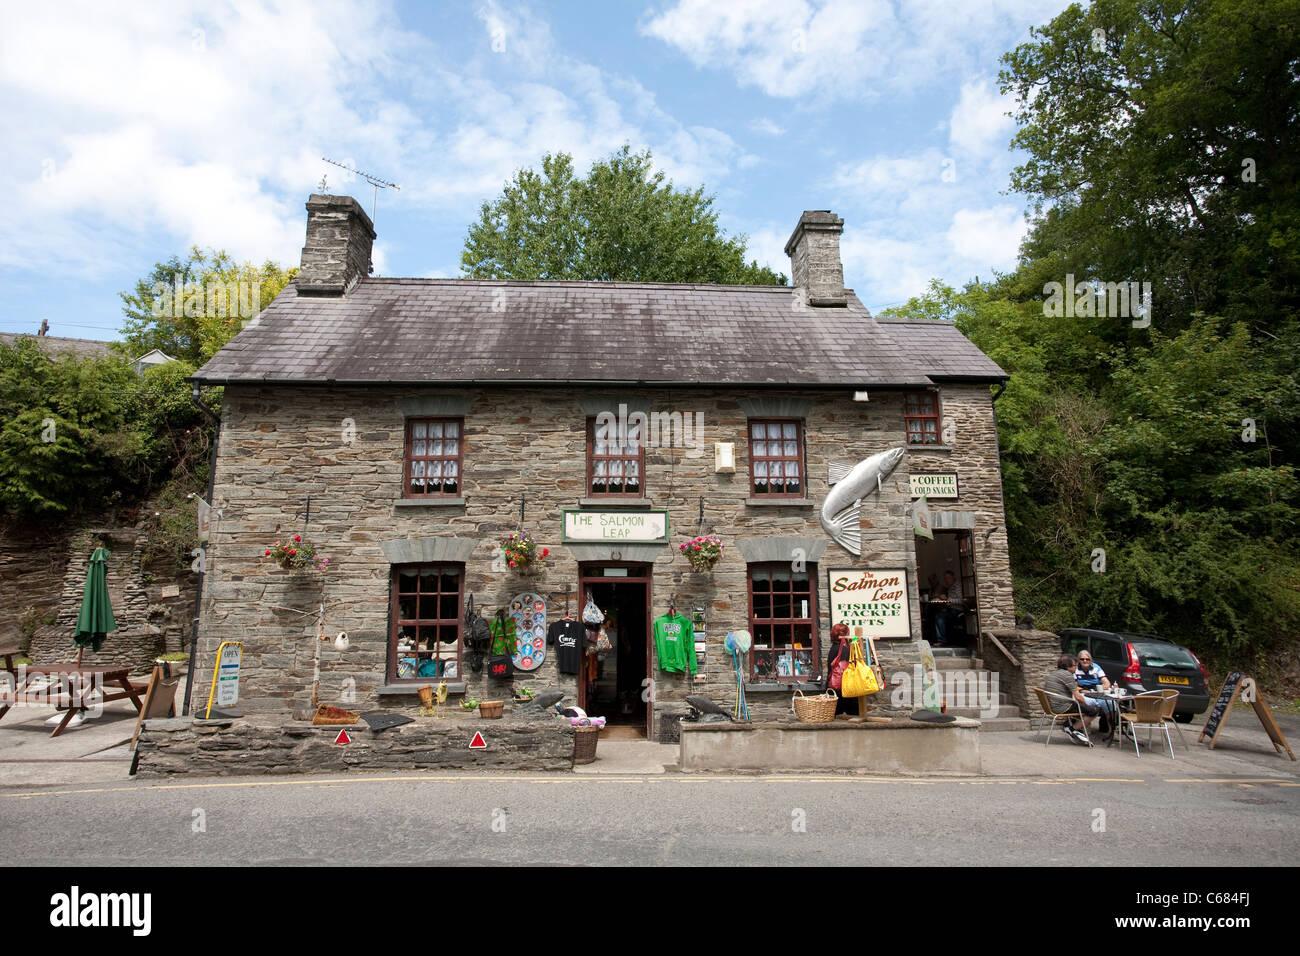 Cenarth, Carmarthenshire, adjoining the Cenarth Falls, bordering Ceredigion and Pembrokeshire, West Wales.Photo:Jeff - Stock Image